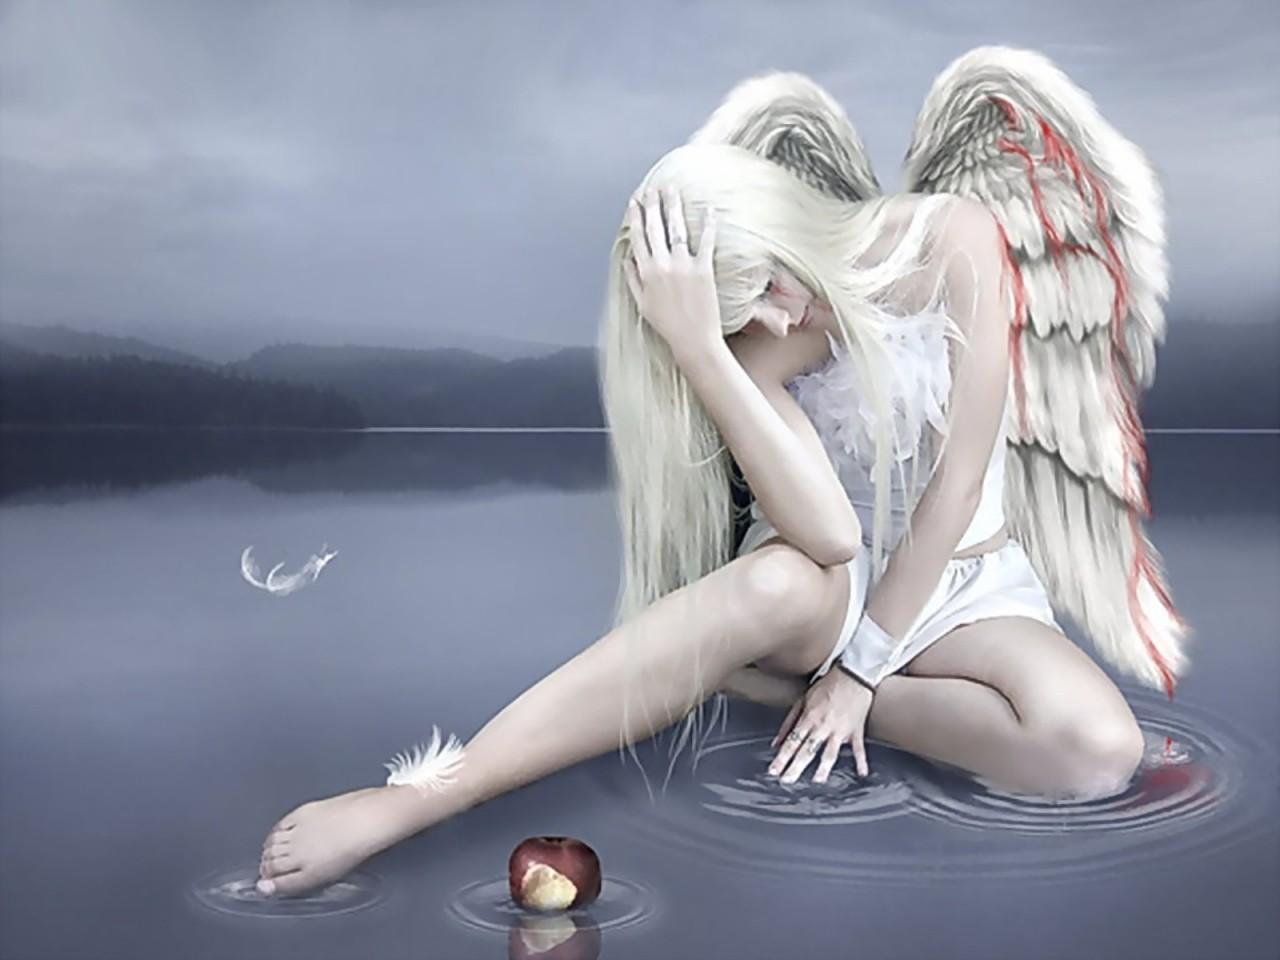 картинка ангела сломаны крылья конкурируем друг другом